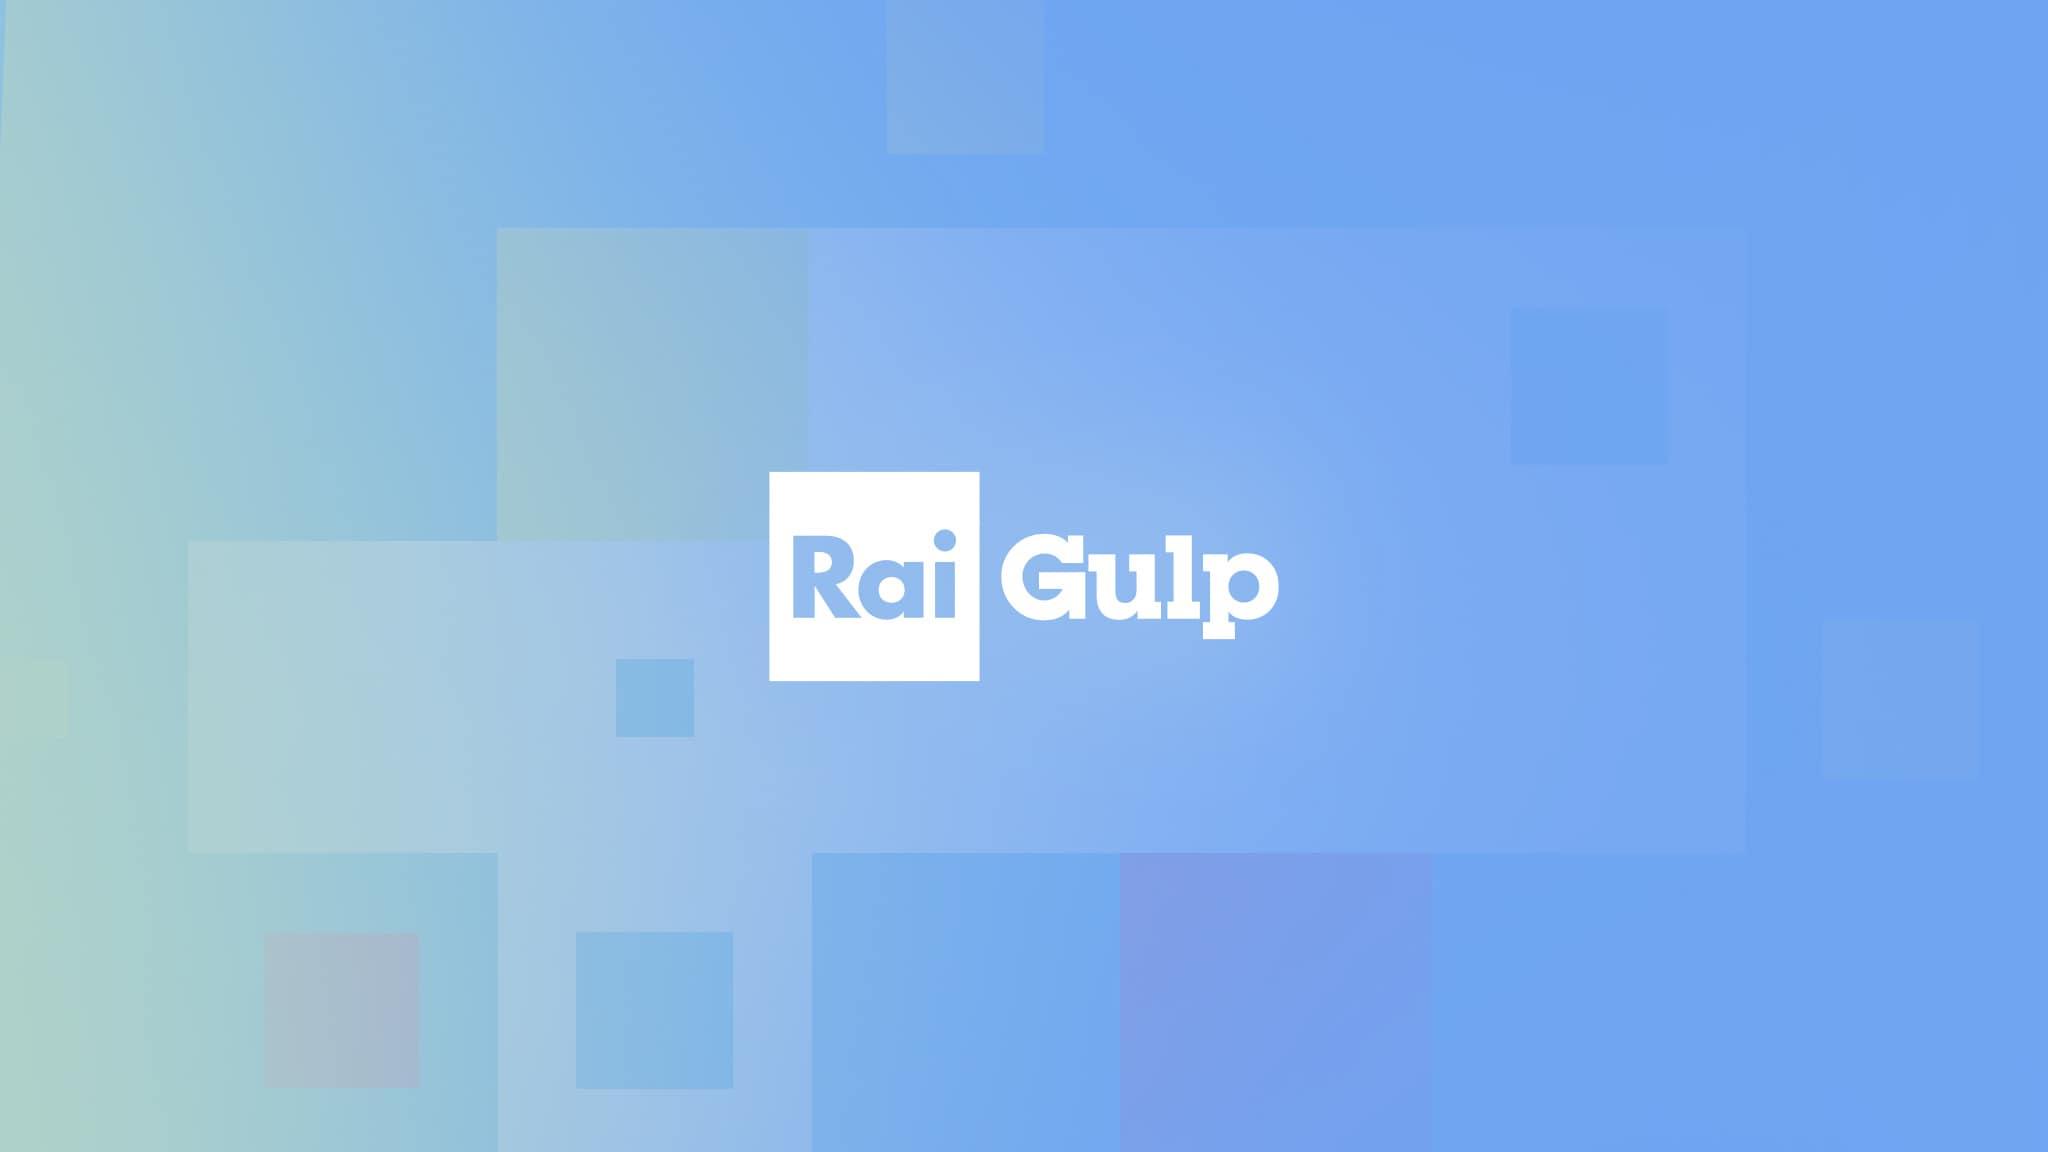 Rai Gulp 101 Dalmatian Street - S1E8